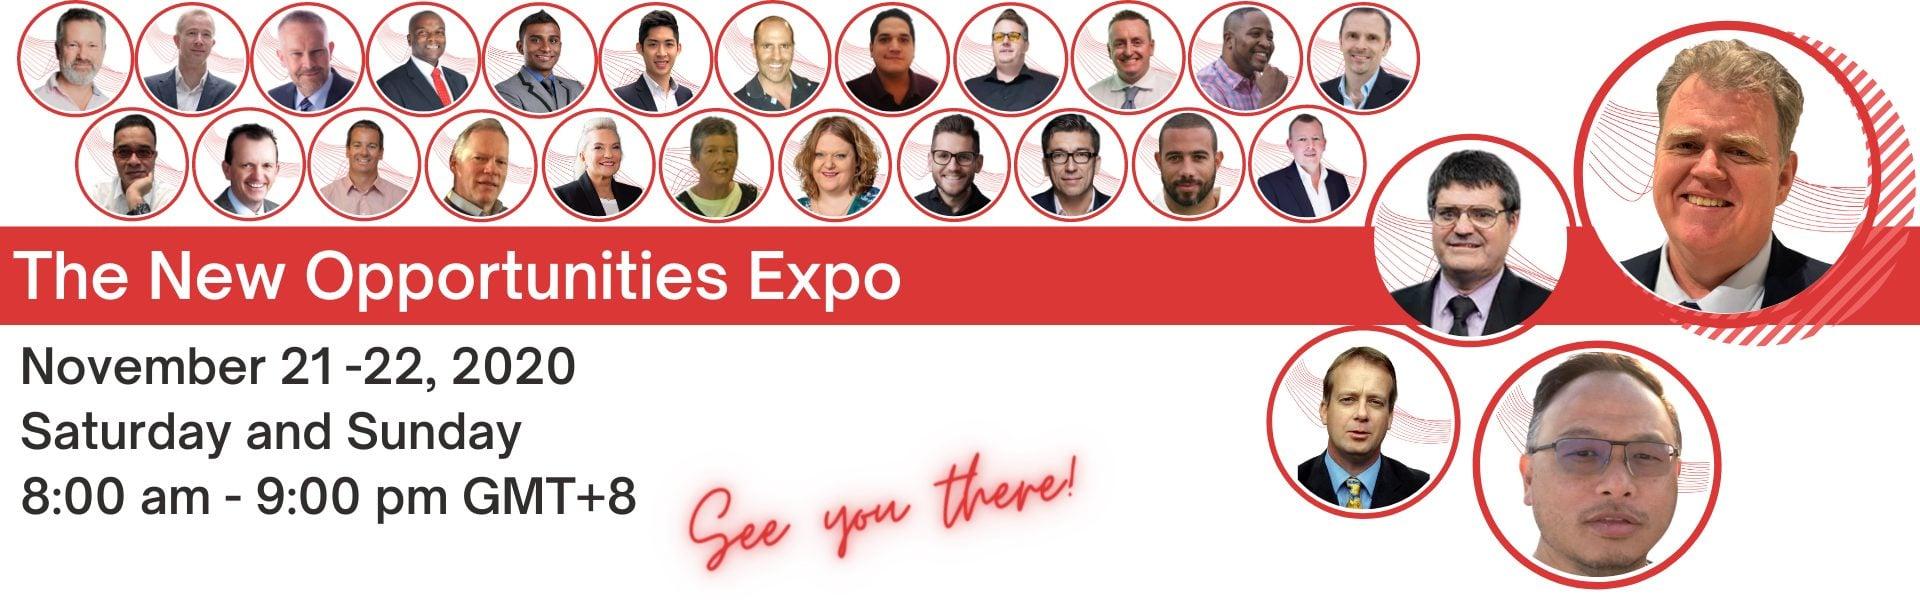 New Opportunities Expo November 2020